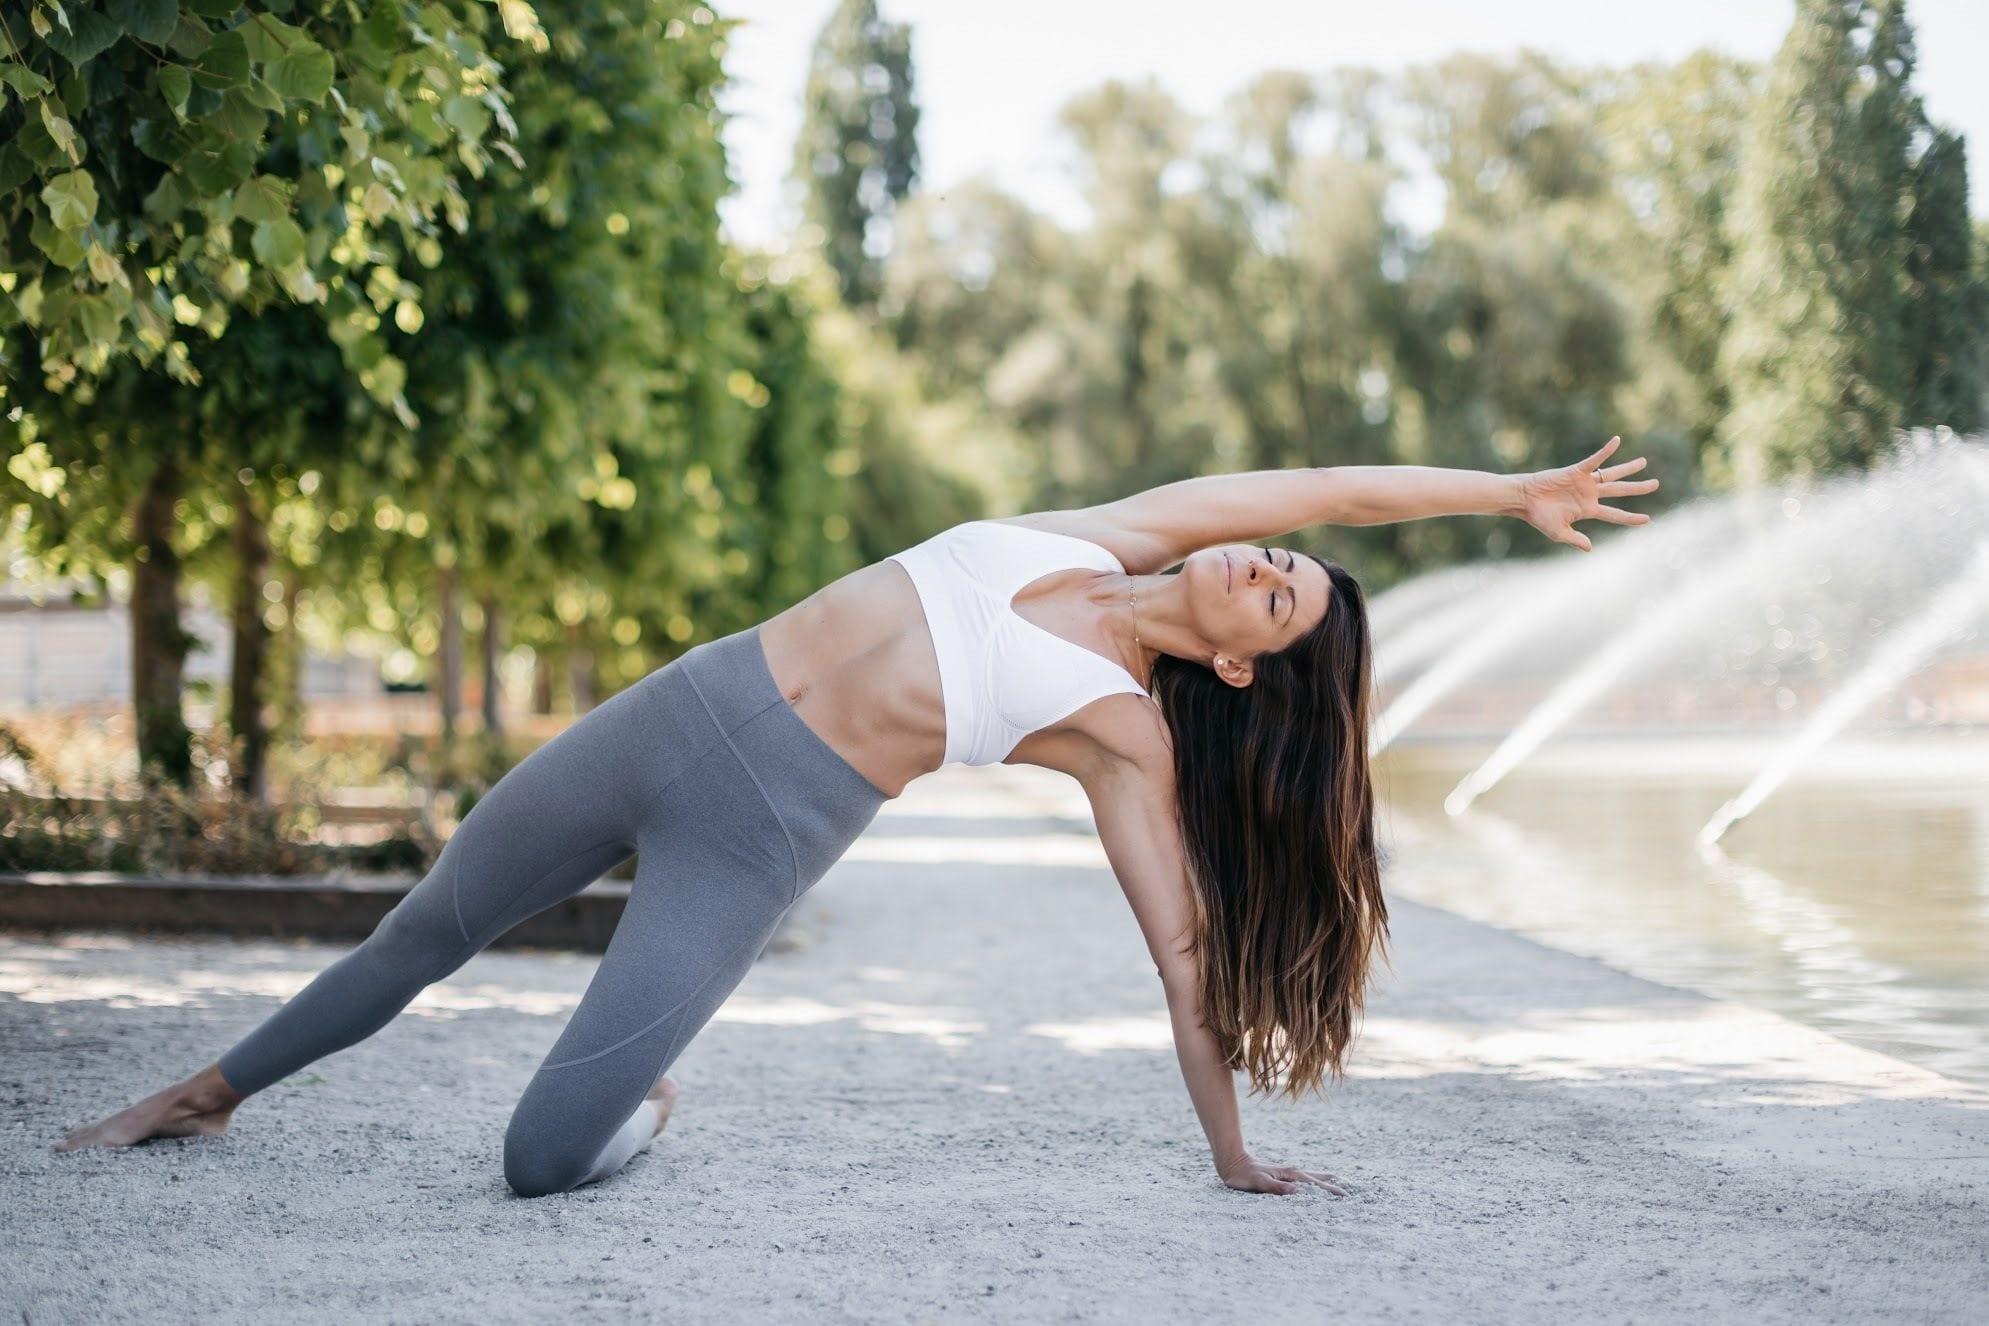 It Starts at Home: 10-Day Yoga Challenge Starts Jan 22